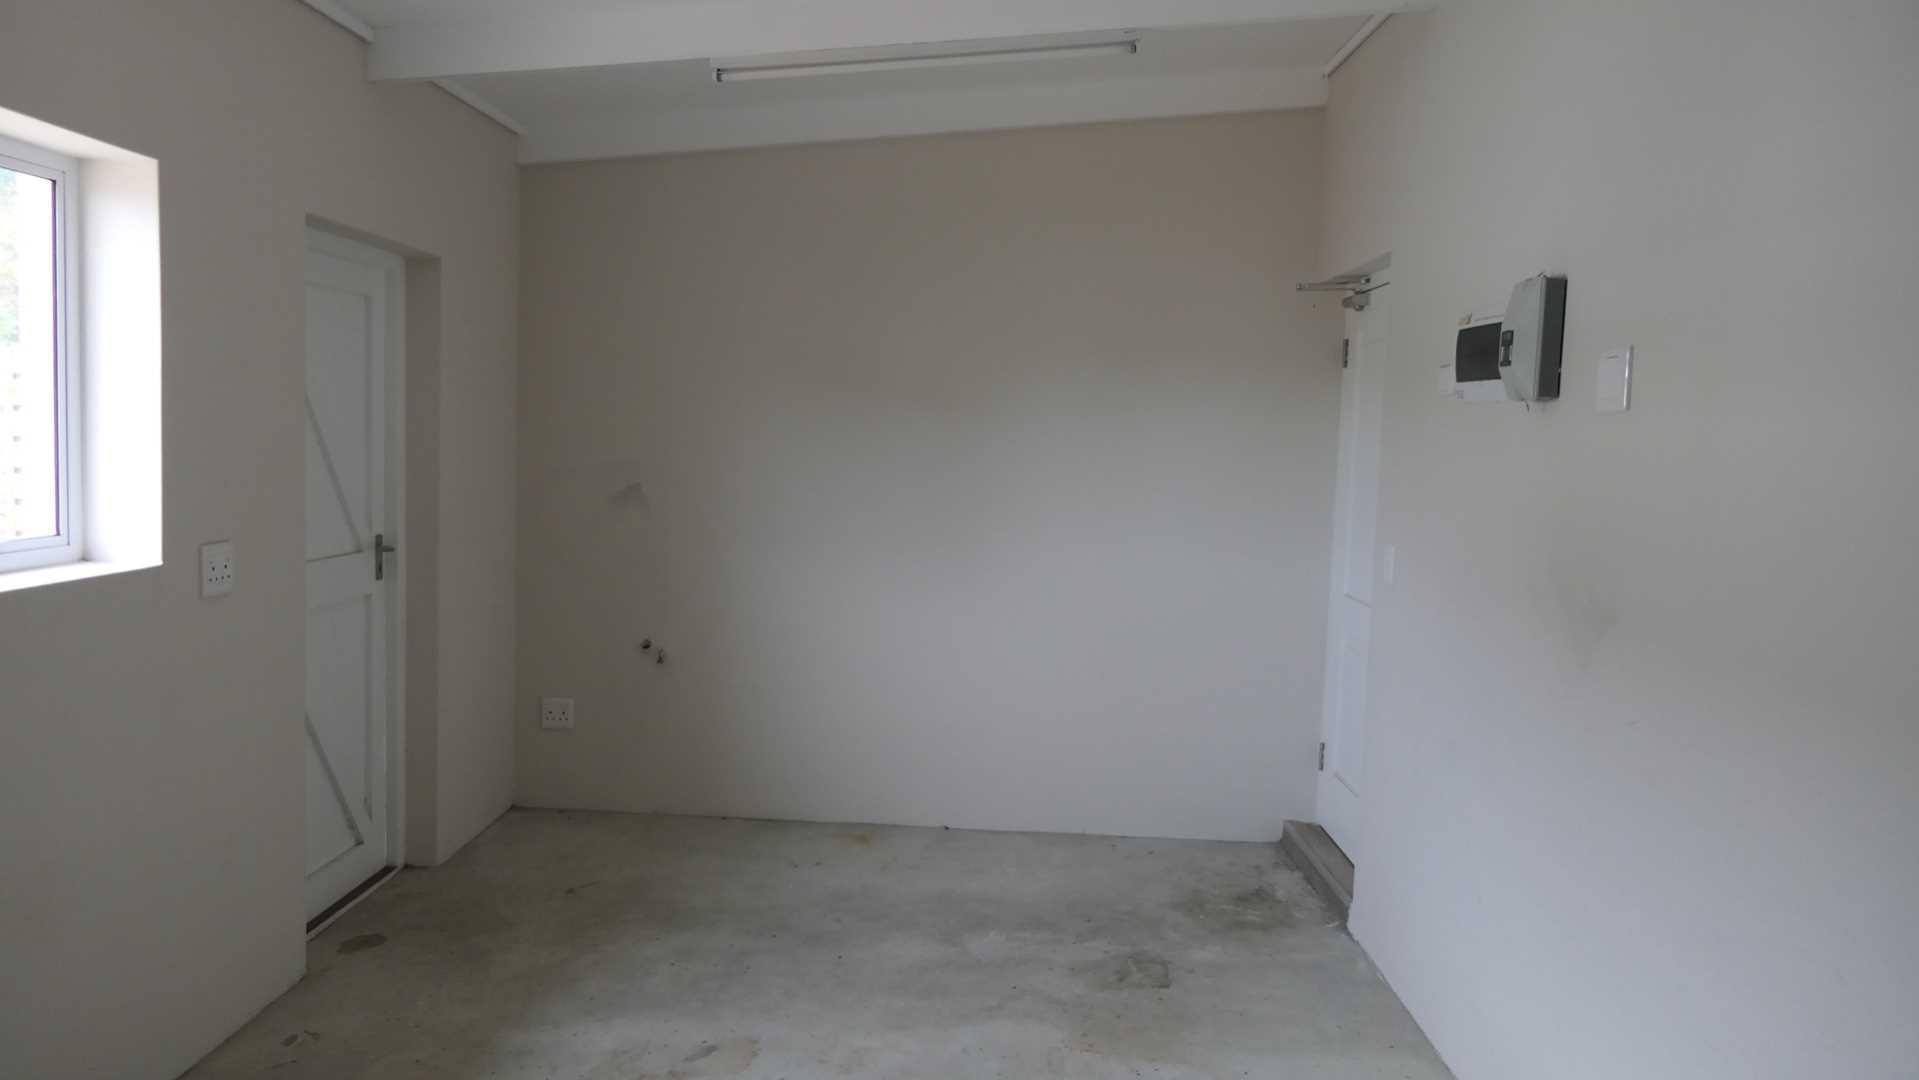 Property for sale in Onrus, Hermanus